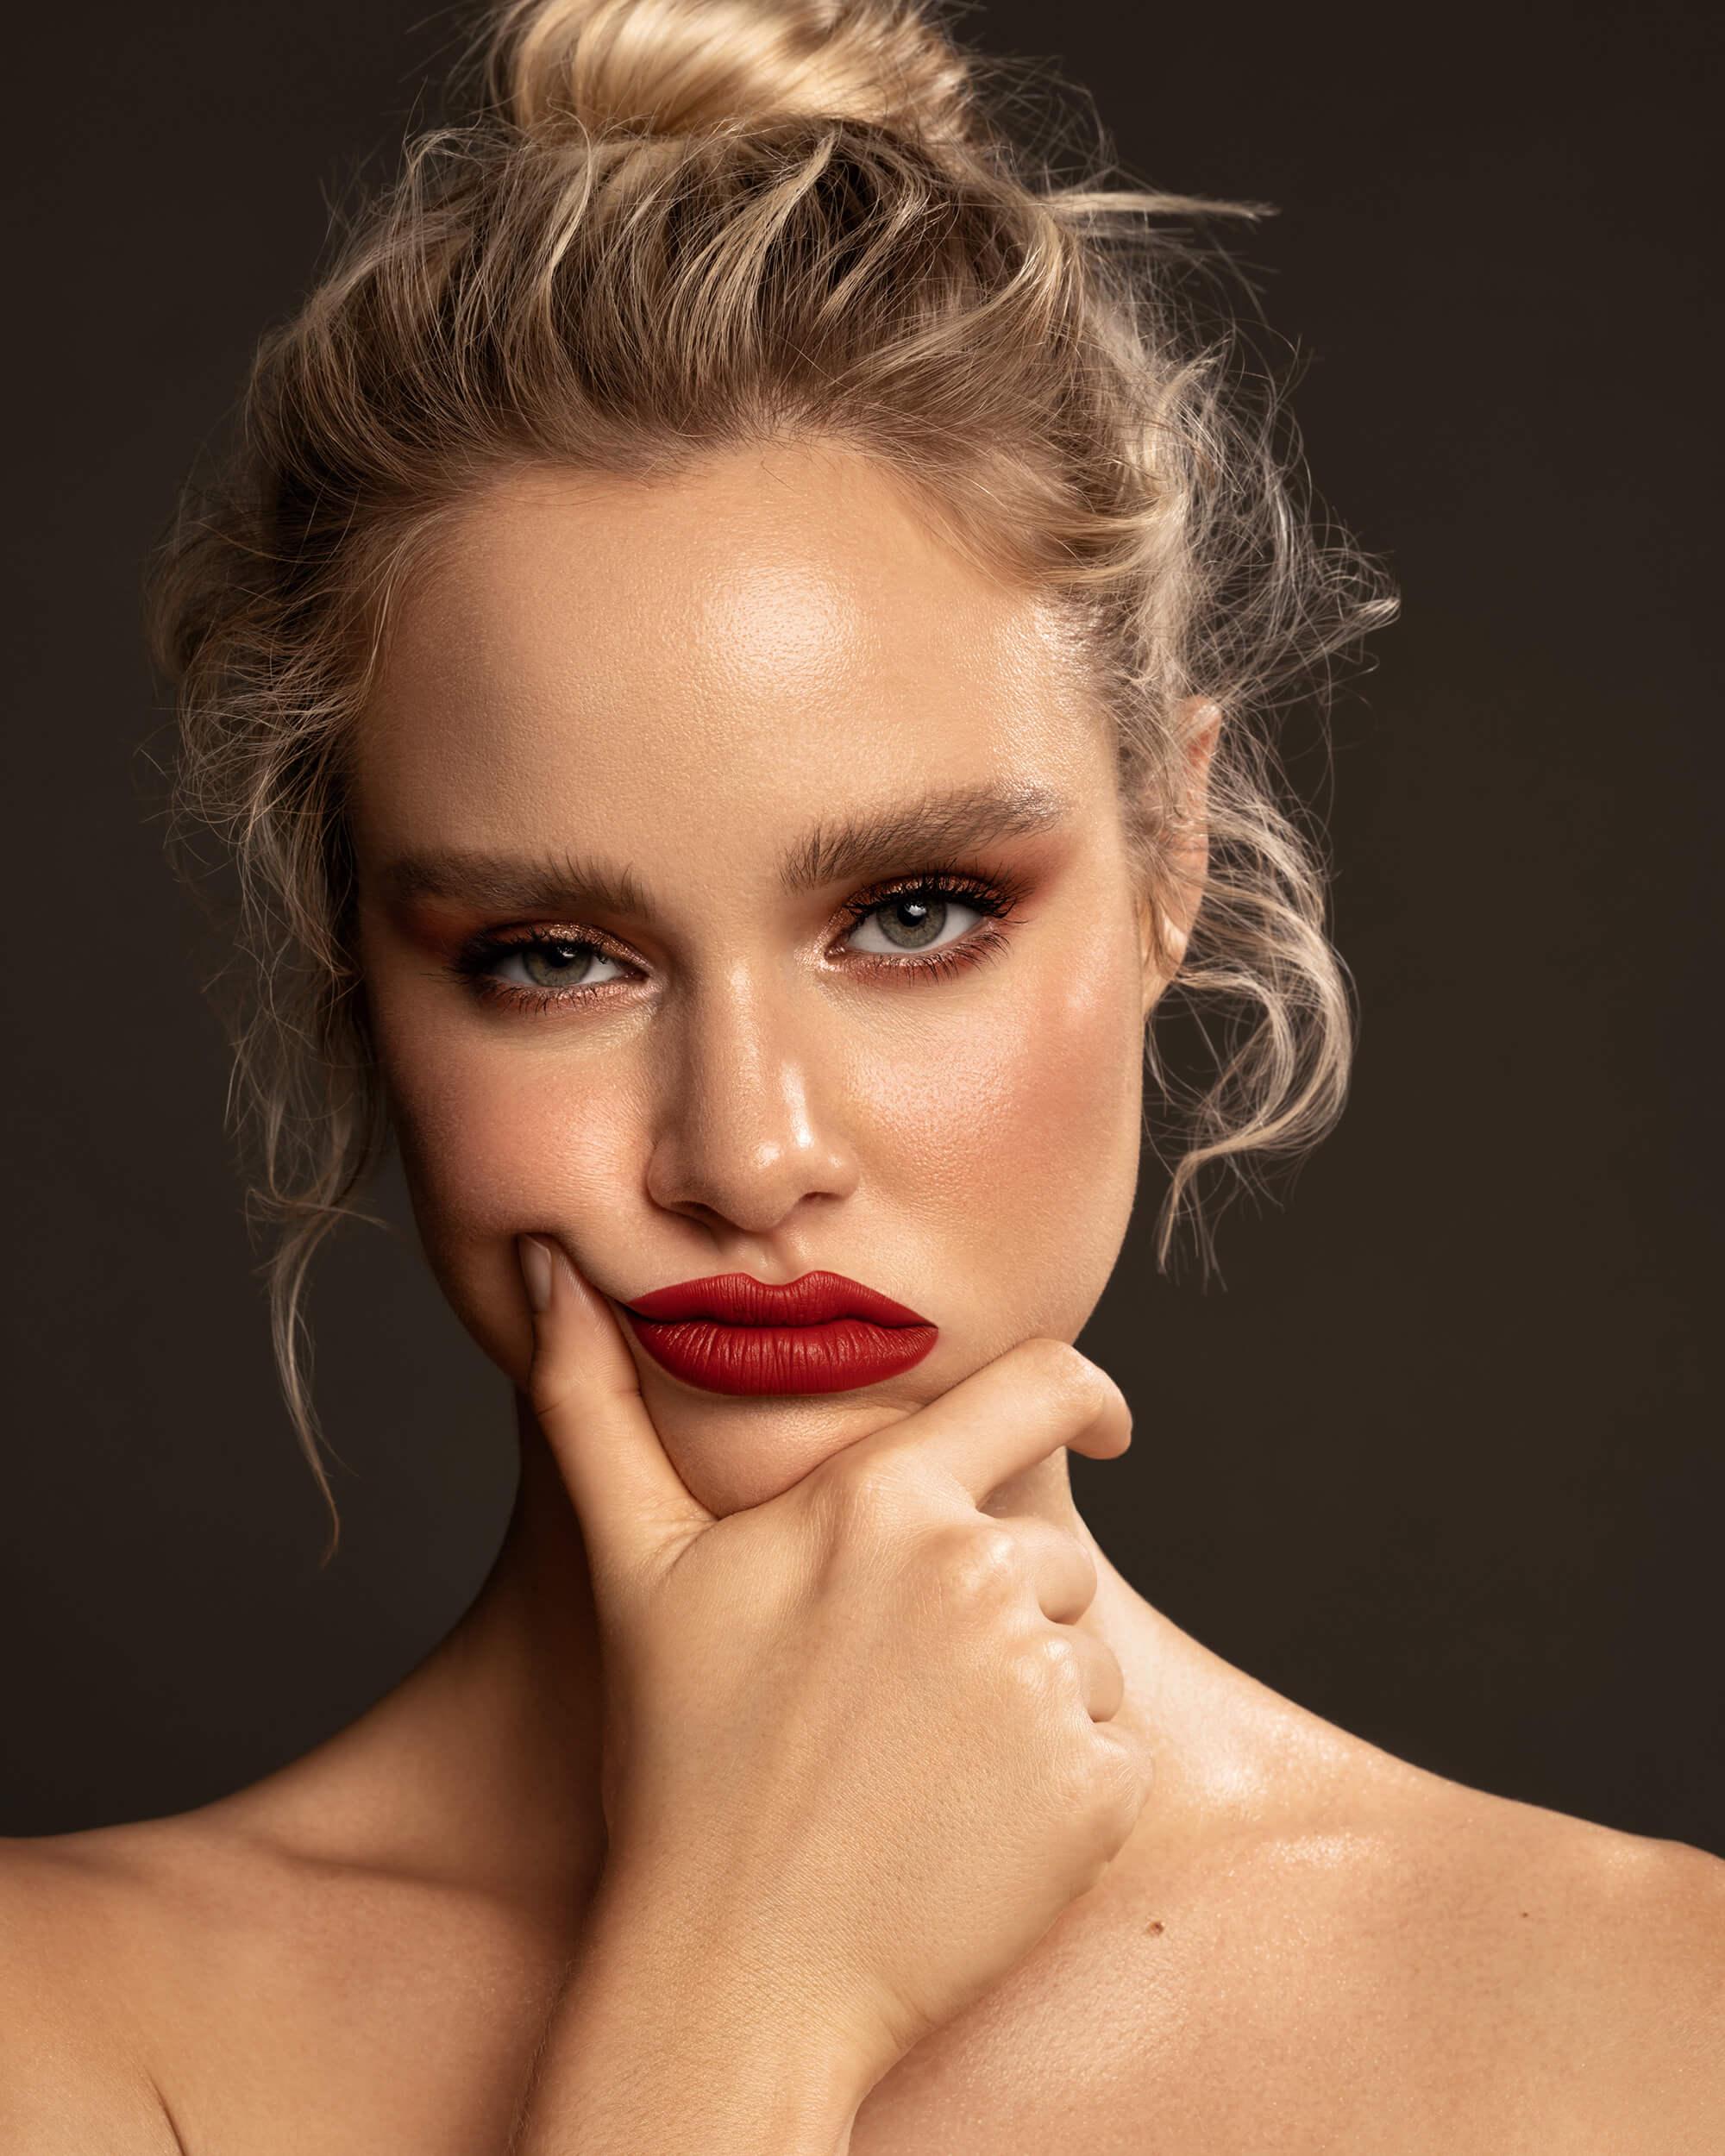 beauty-Los-Angeles-Beauty-Photography-Chasey